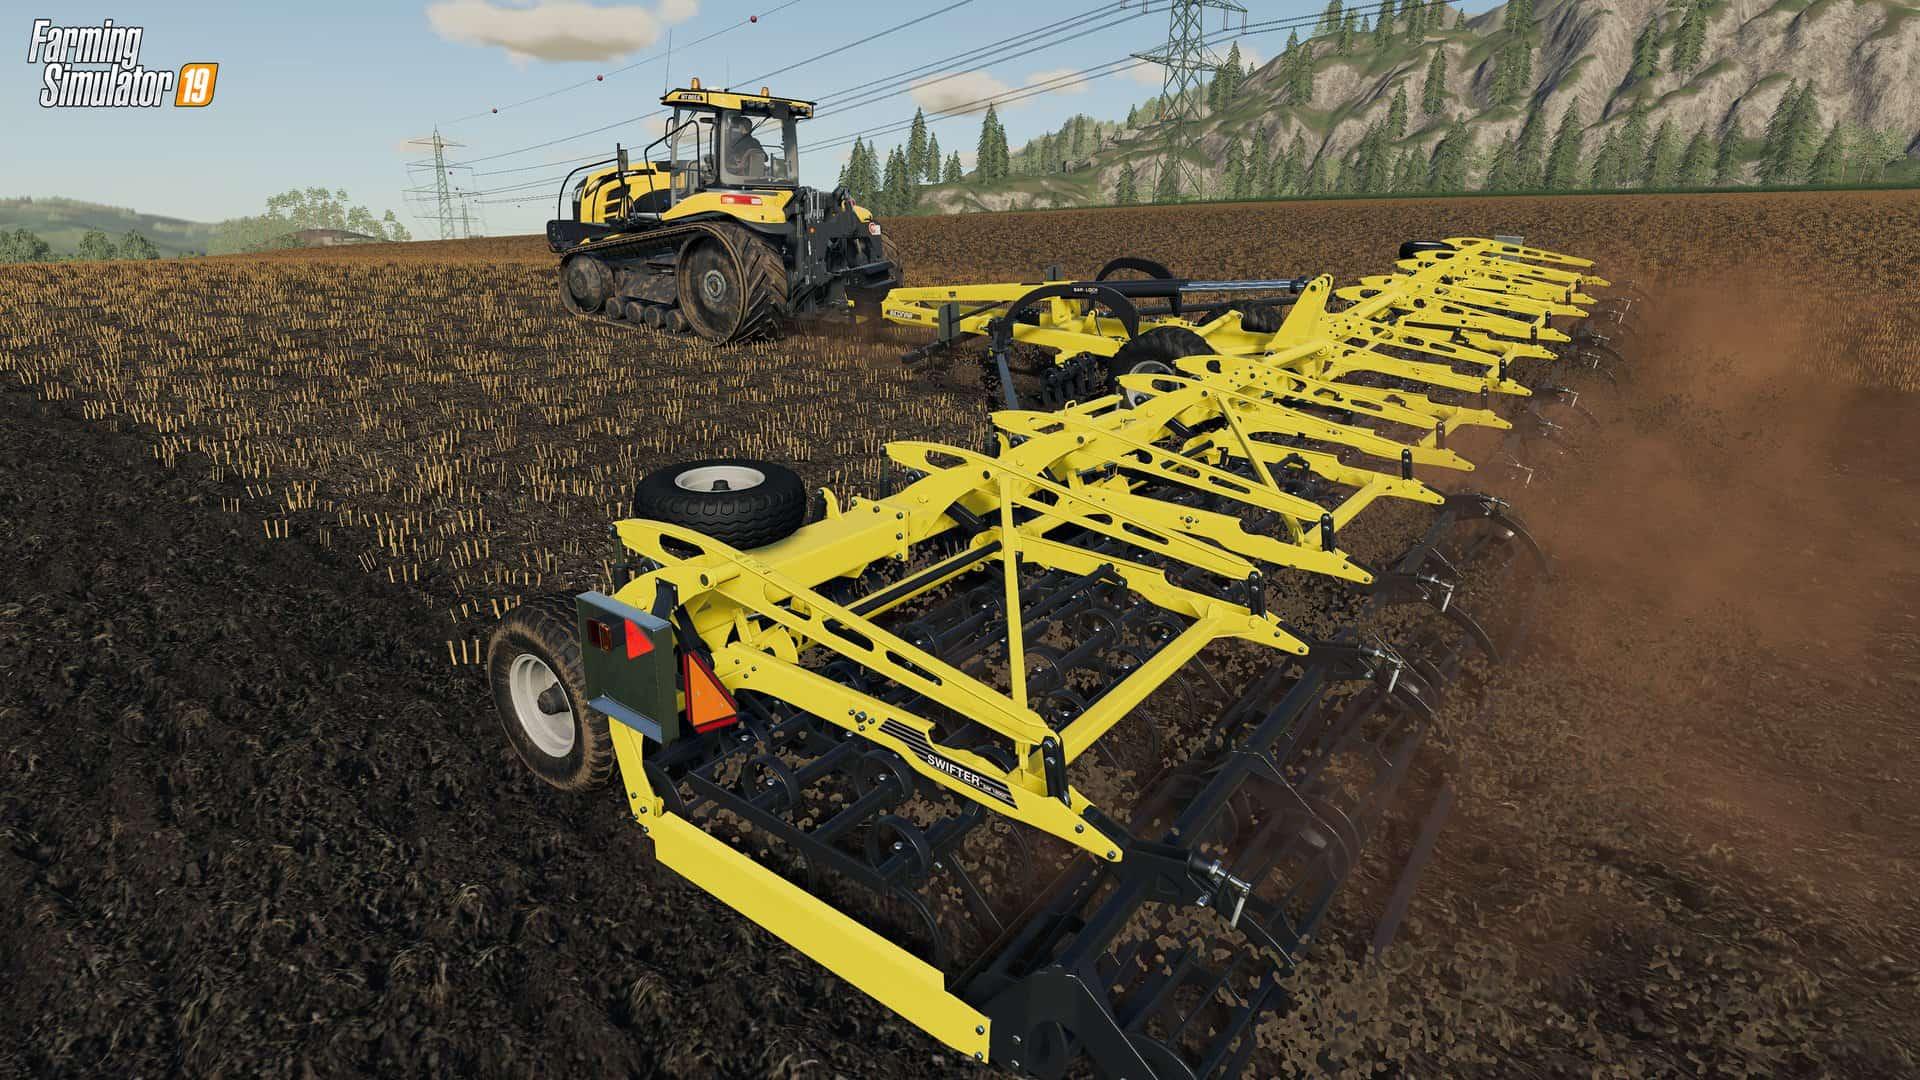 BEDNAR FMT machines in Farming Simulator 2019 - Farming